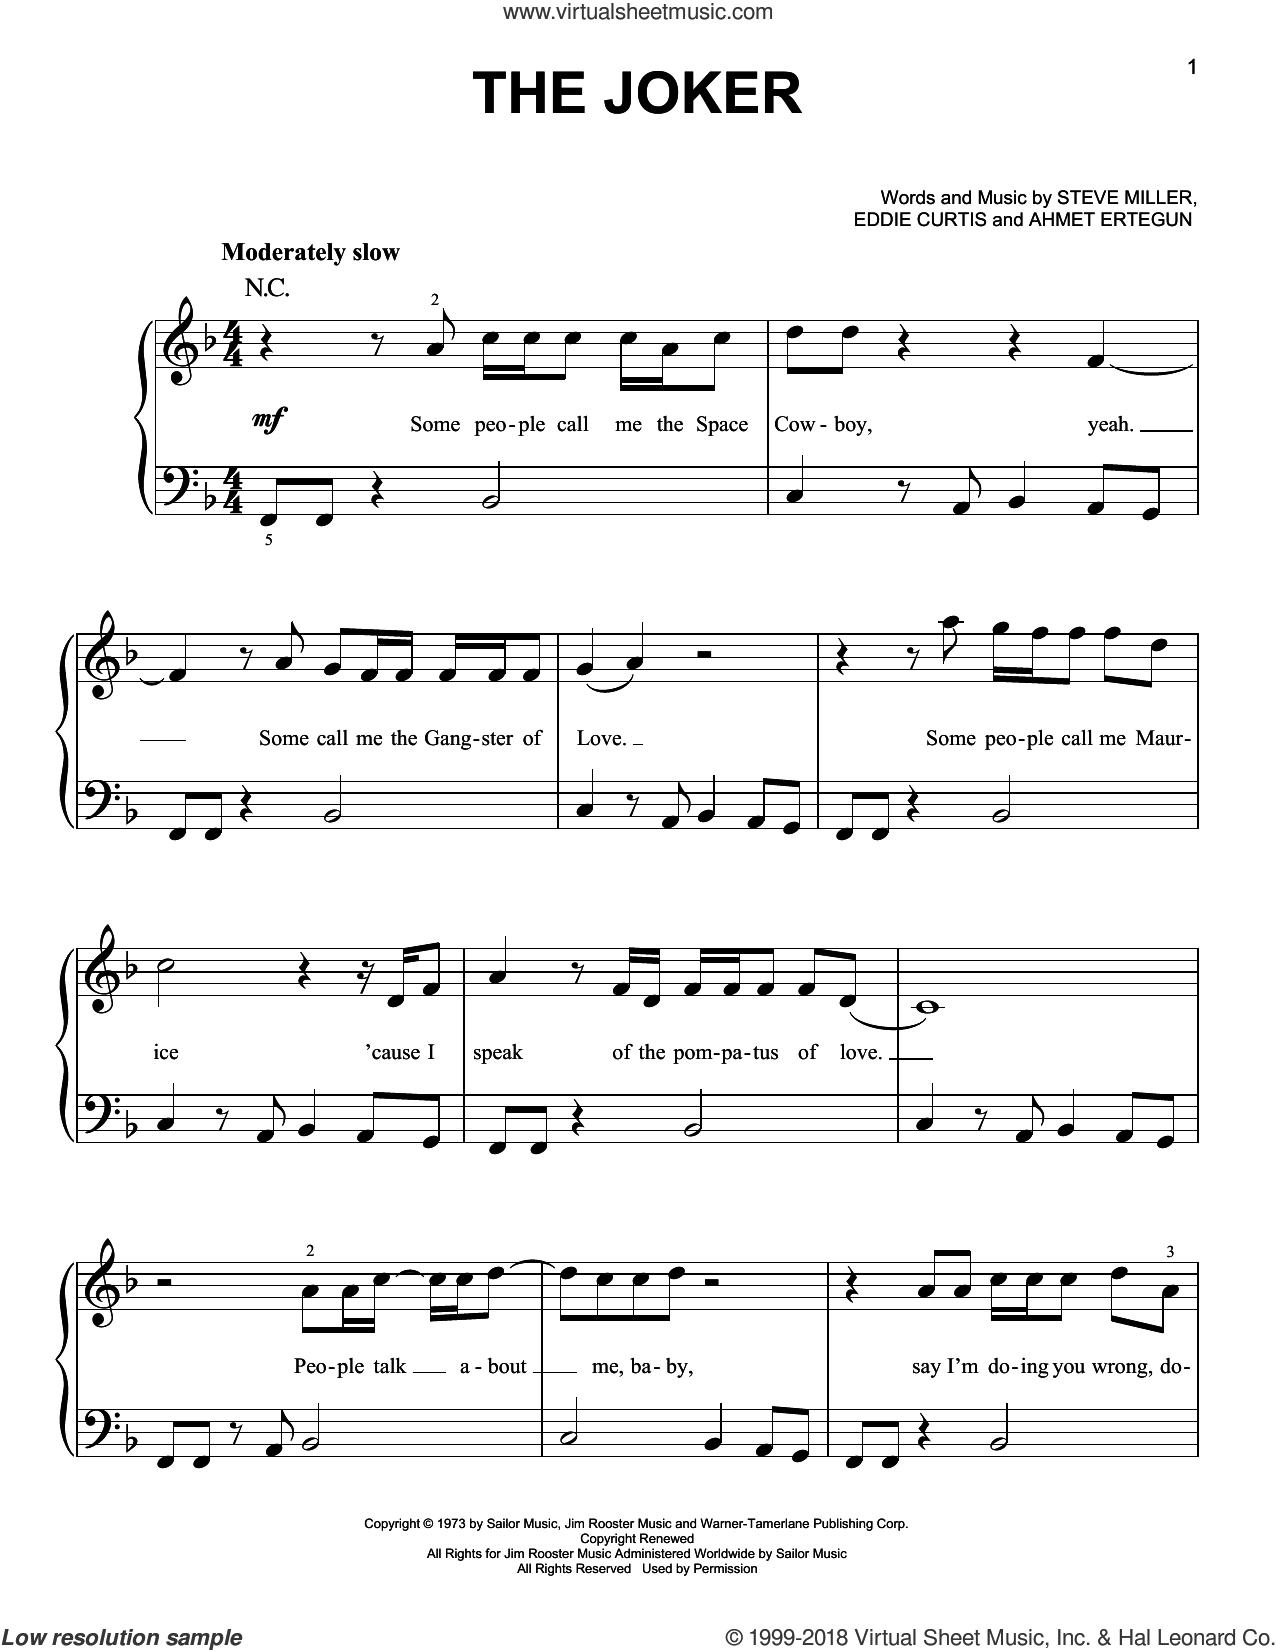 The Joker sheet music for piano solo by Steve Miller Band, Ahmet Ertegun and Eddie Curtis, beginner skill level